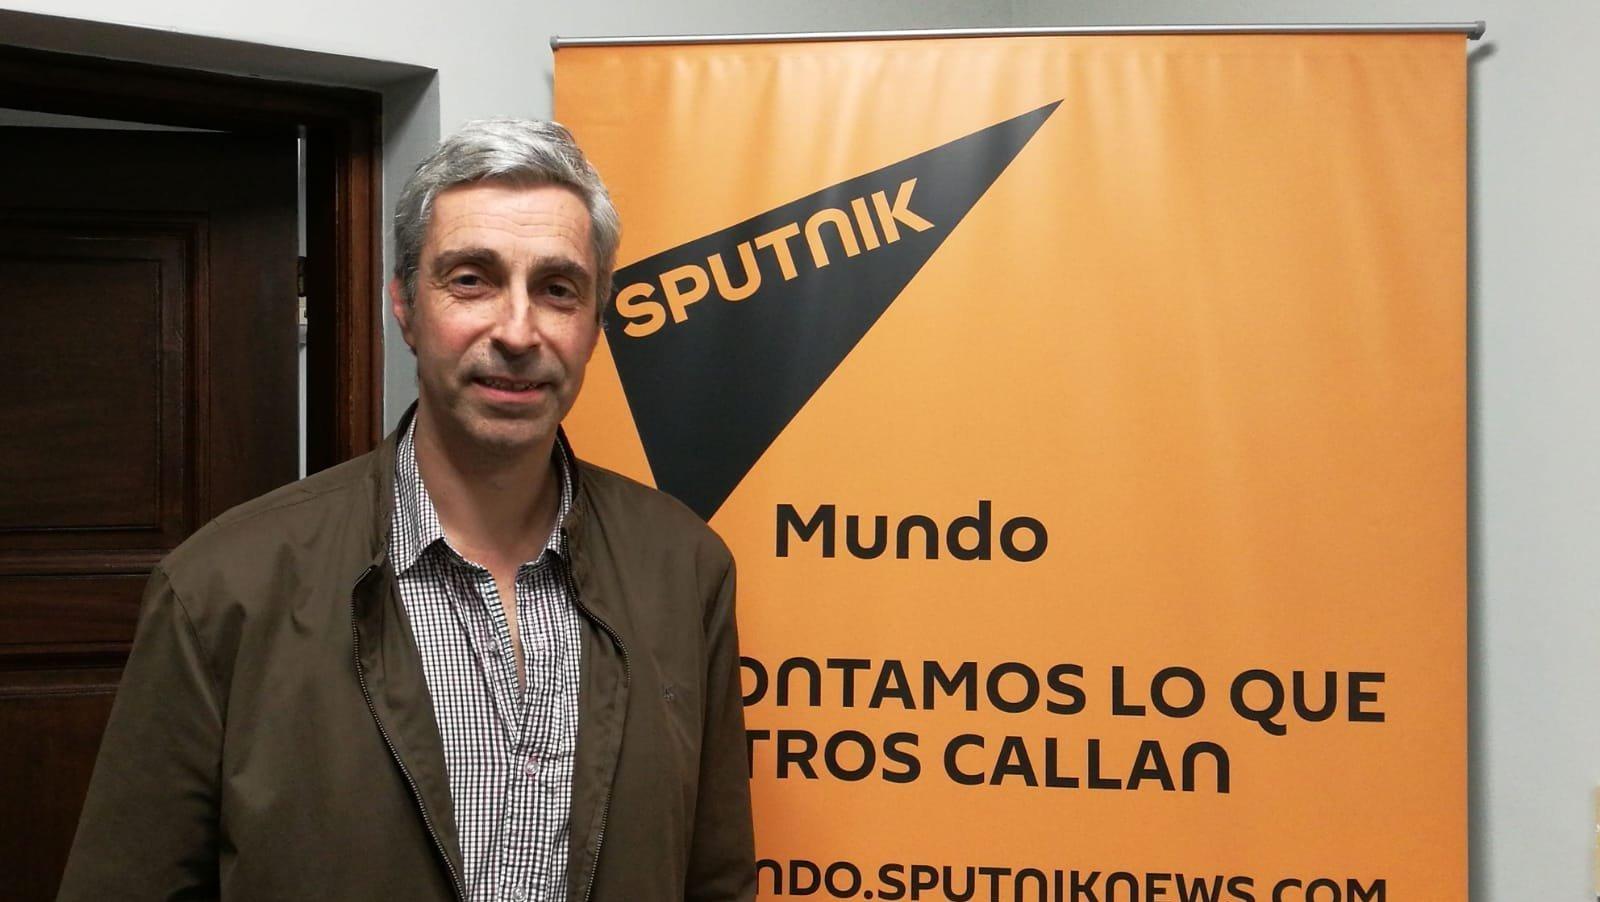 Profesor José Luis Medina Zorrilla de San Martín